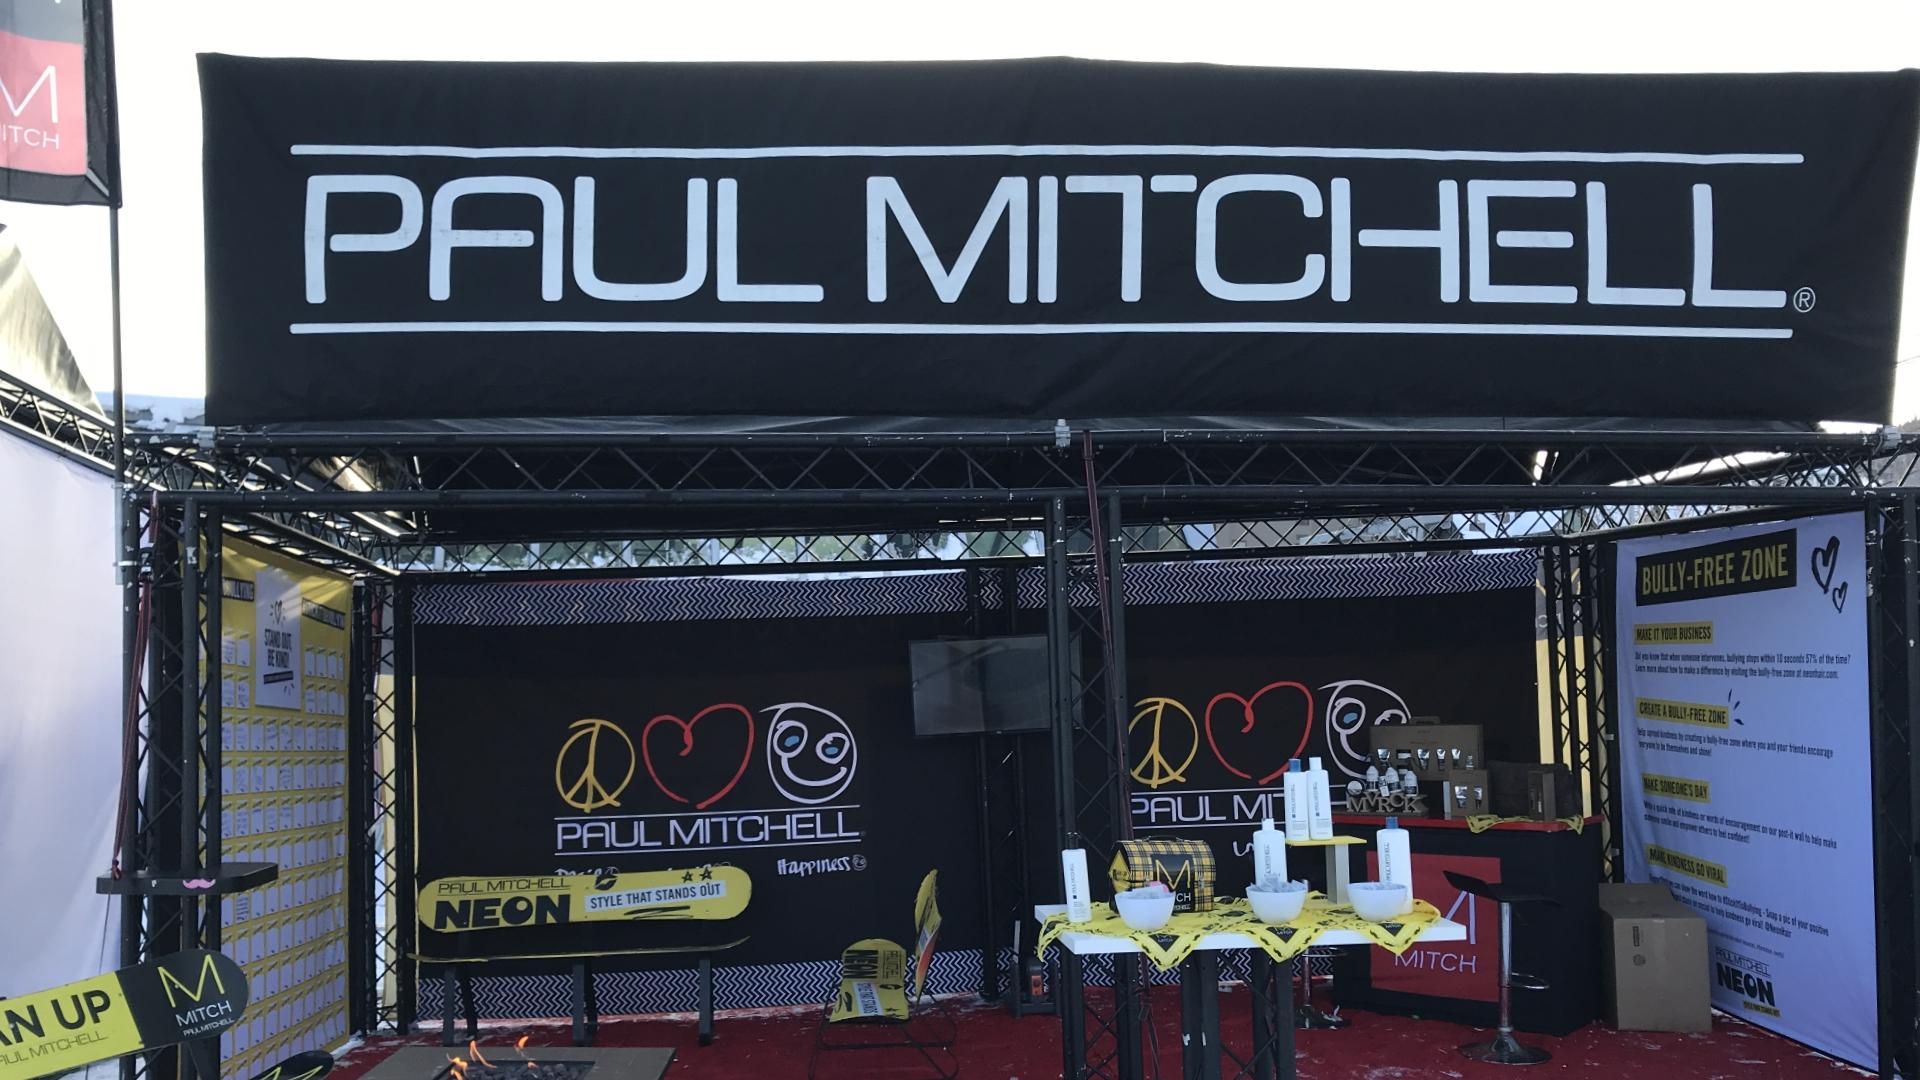 Paul-Mitchell-Render-–-1-1.jpg